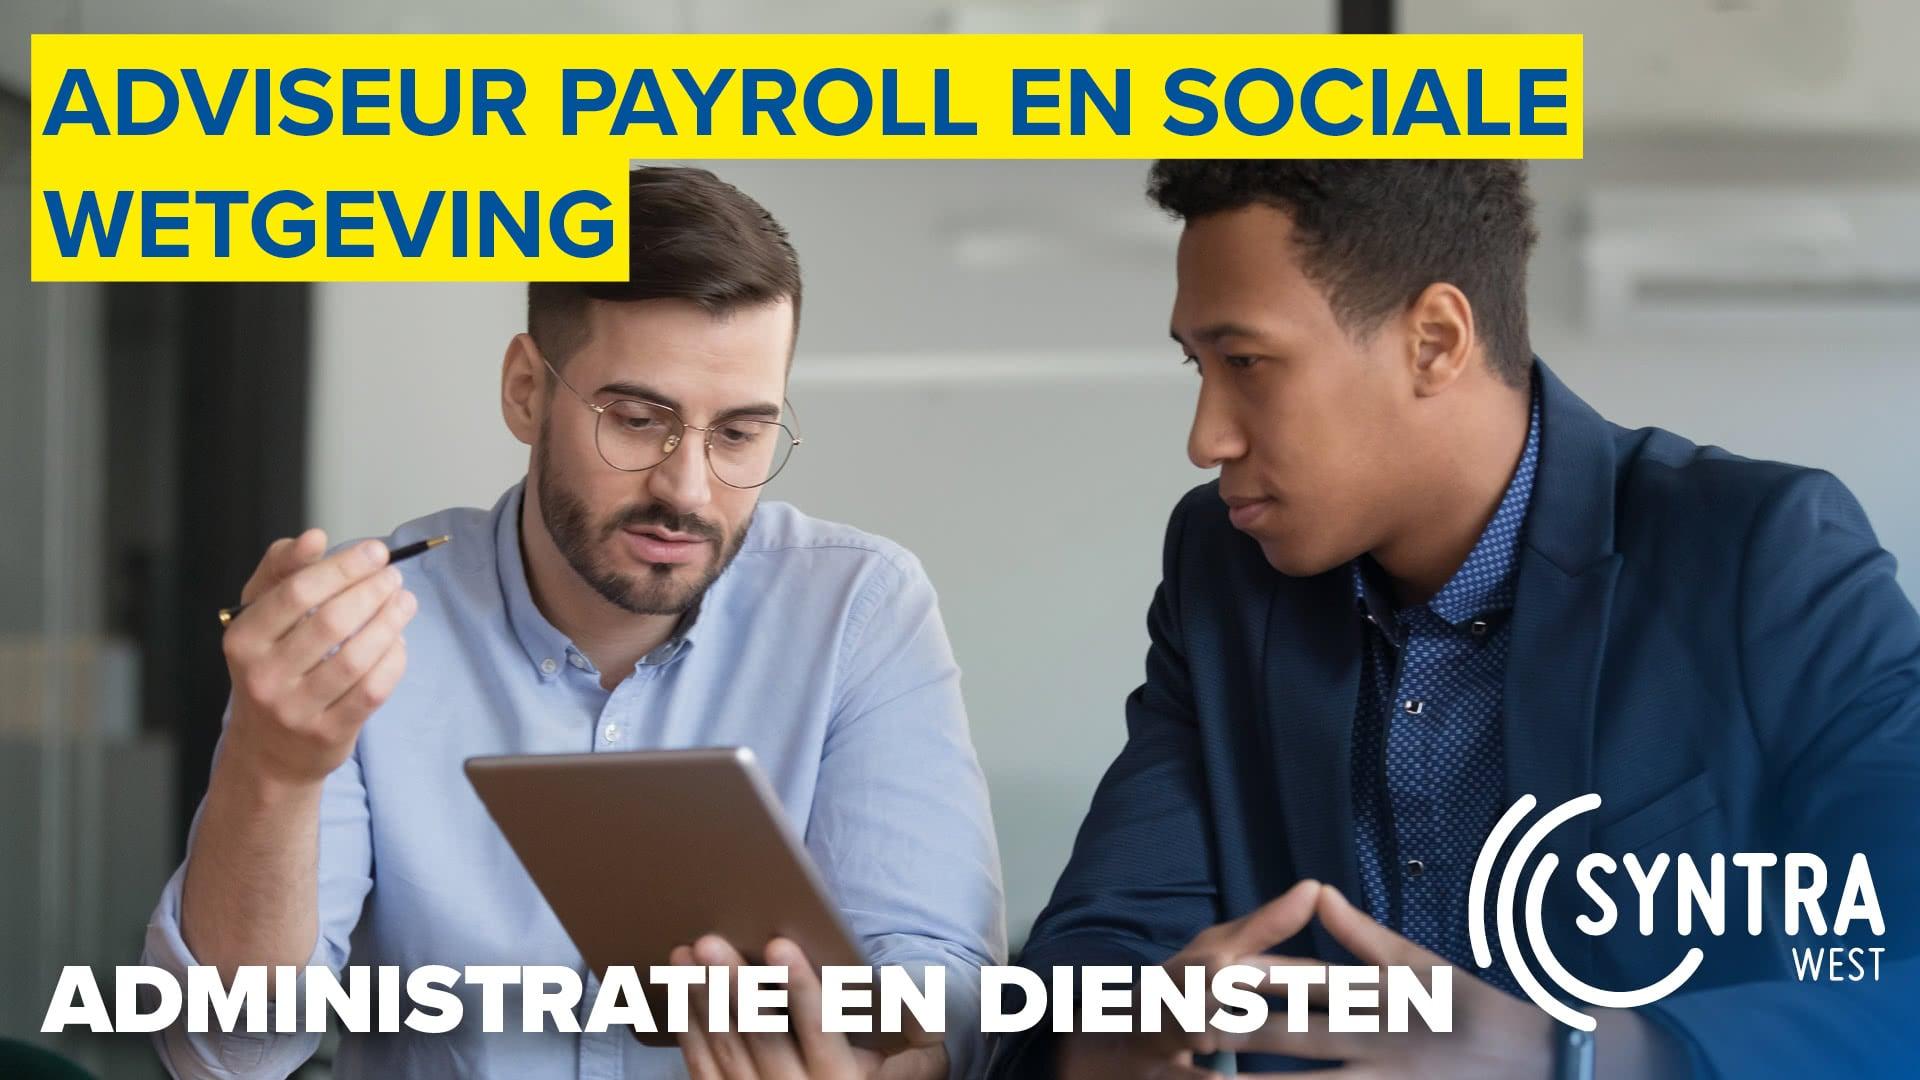 Adviseur payroll en sociale wetgeving